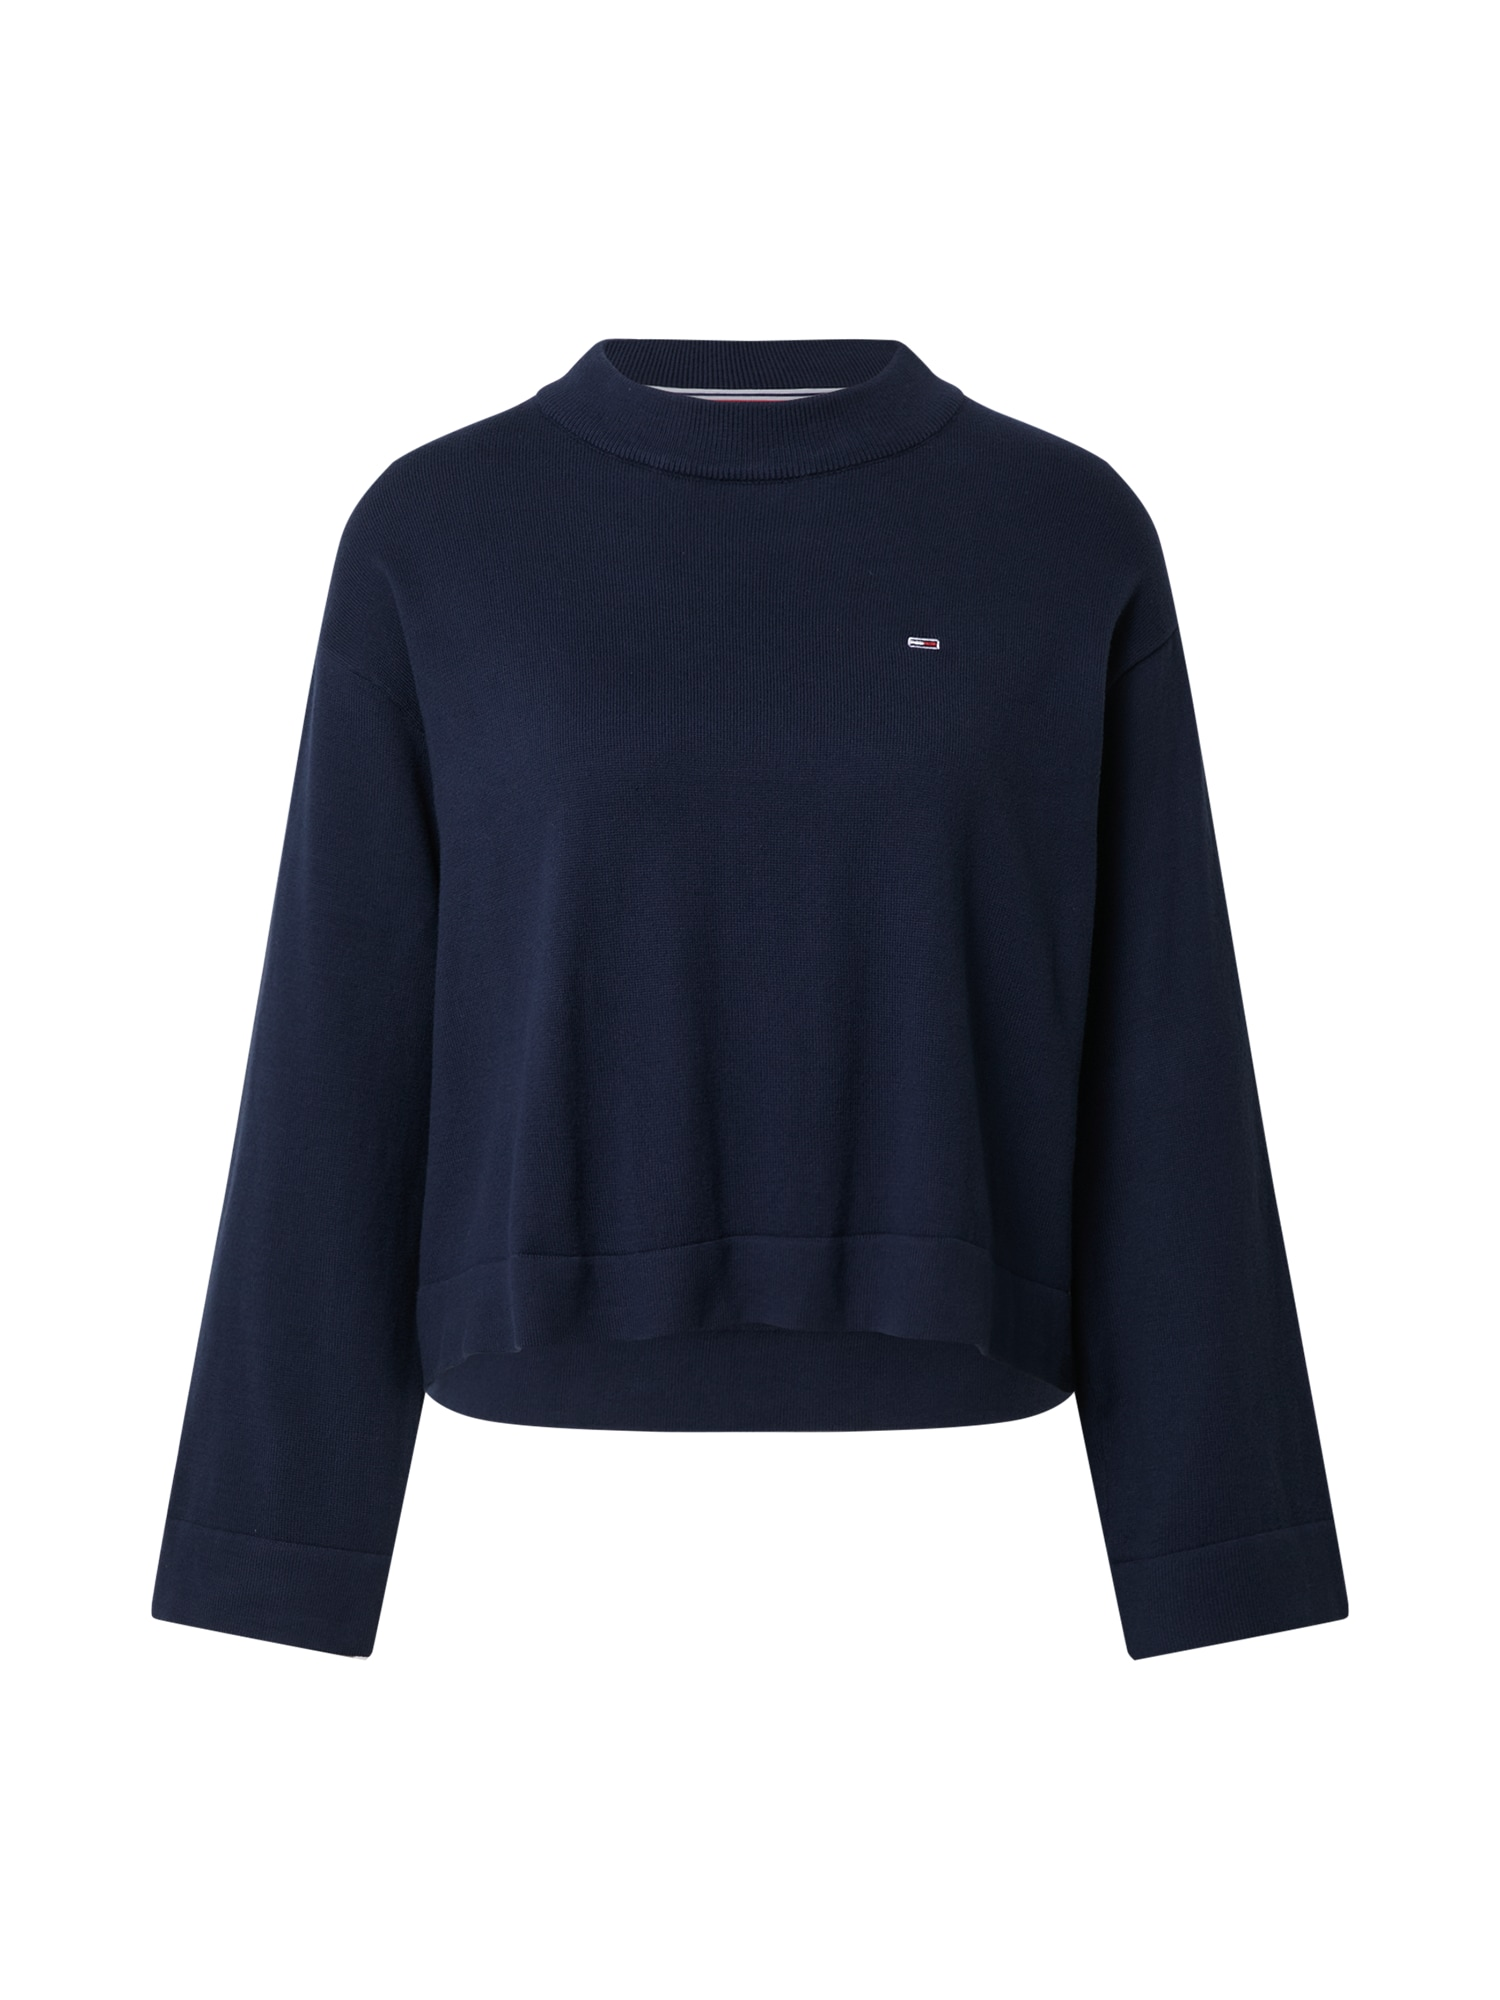 Tommy Jeans Megztinis tamsiai mėlyna / balta / šviesiai raudona